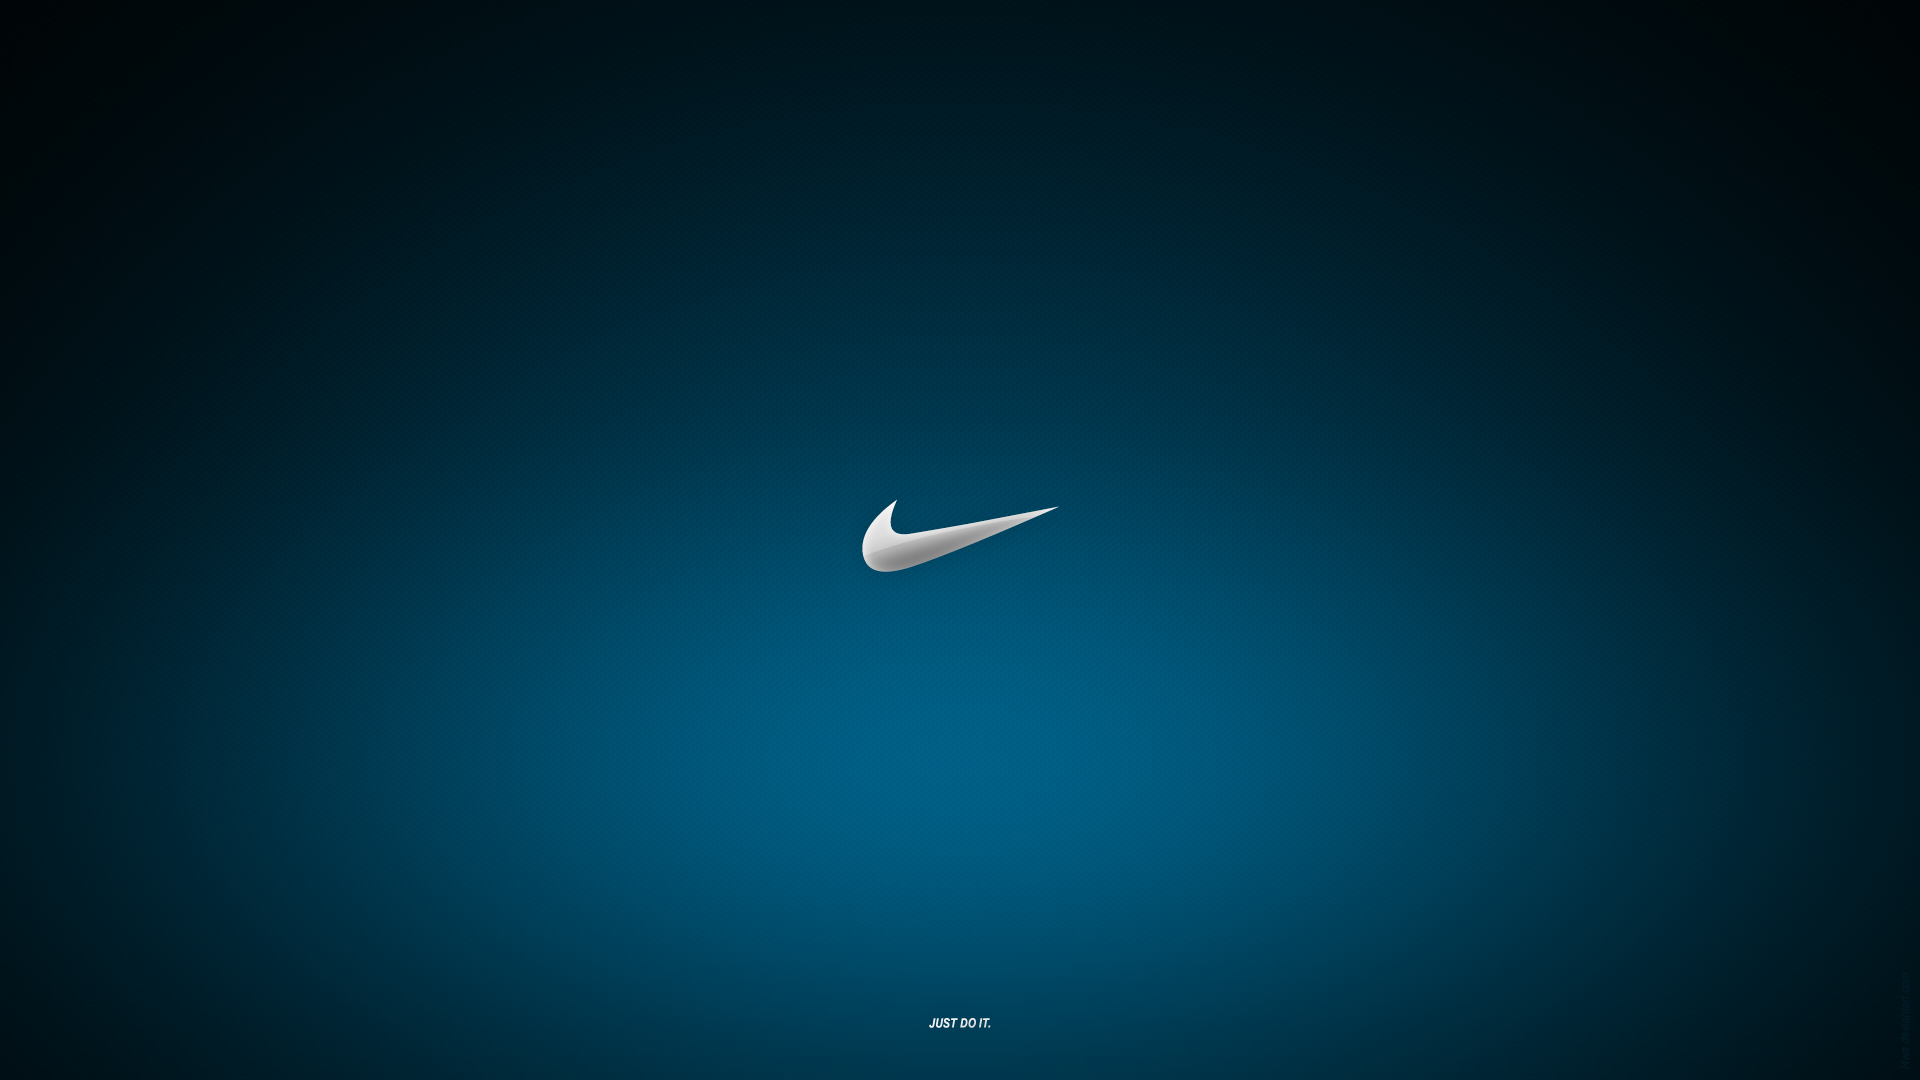 Cool Nike Logo Wallpaper HD   HD Wallpaperia 1920x1080